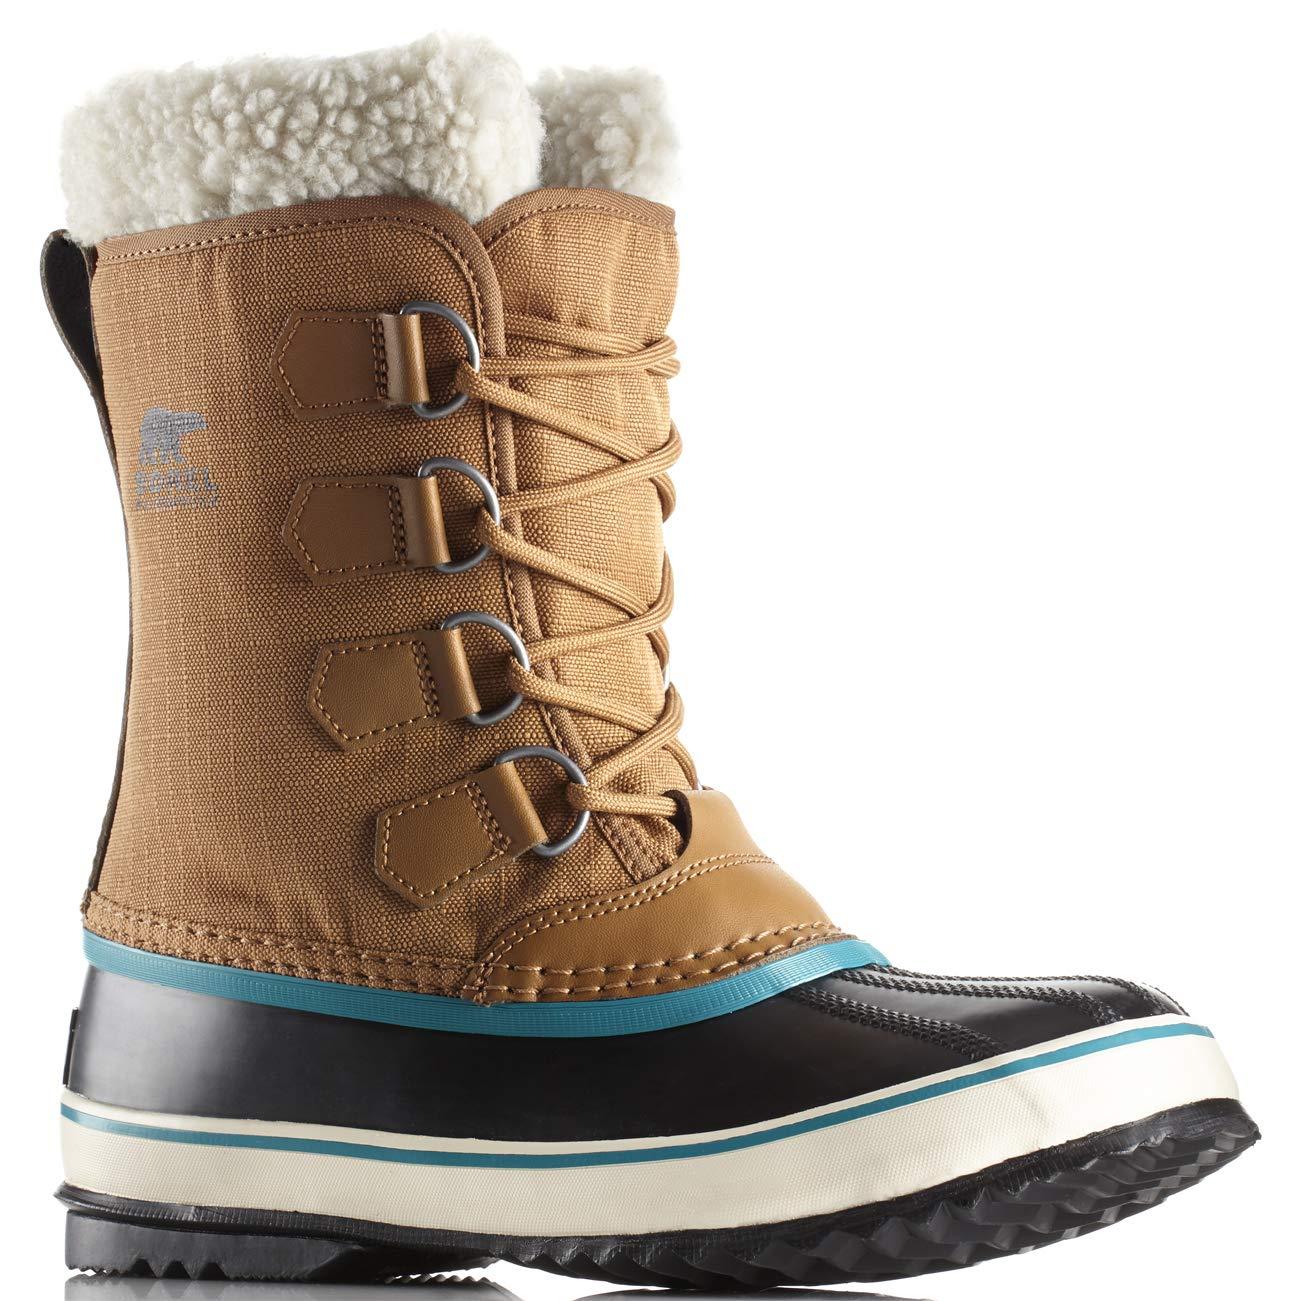 Sorel Damen Winter Carnival Stiefel